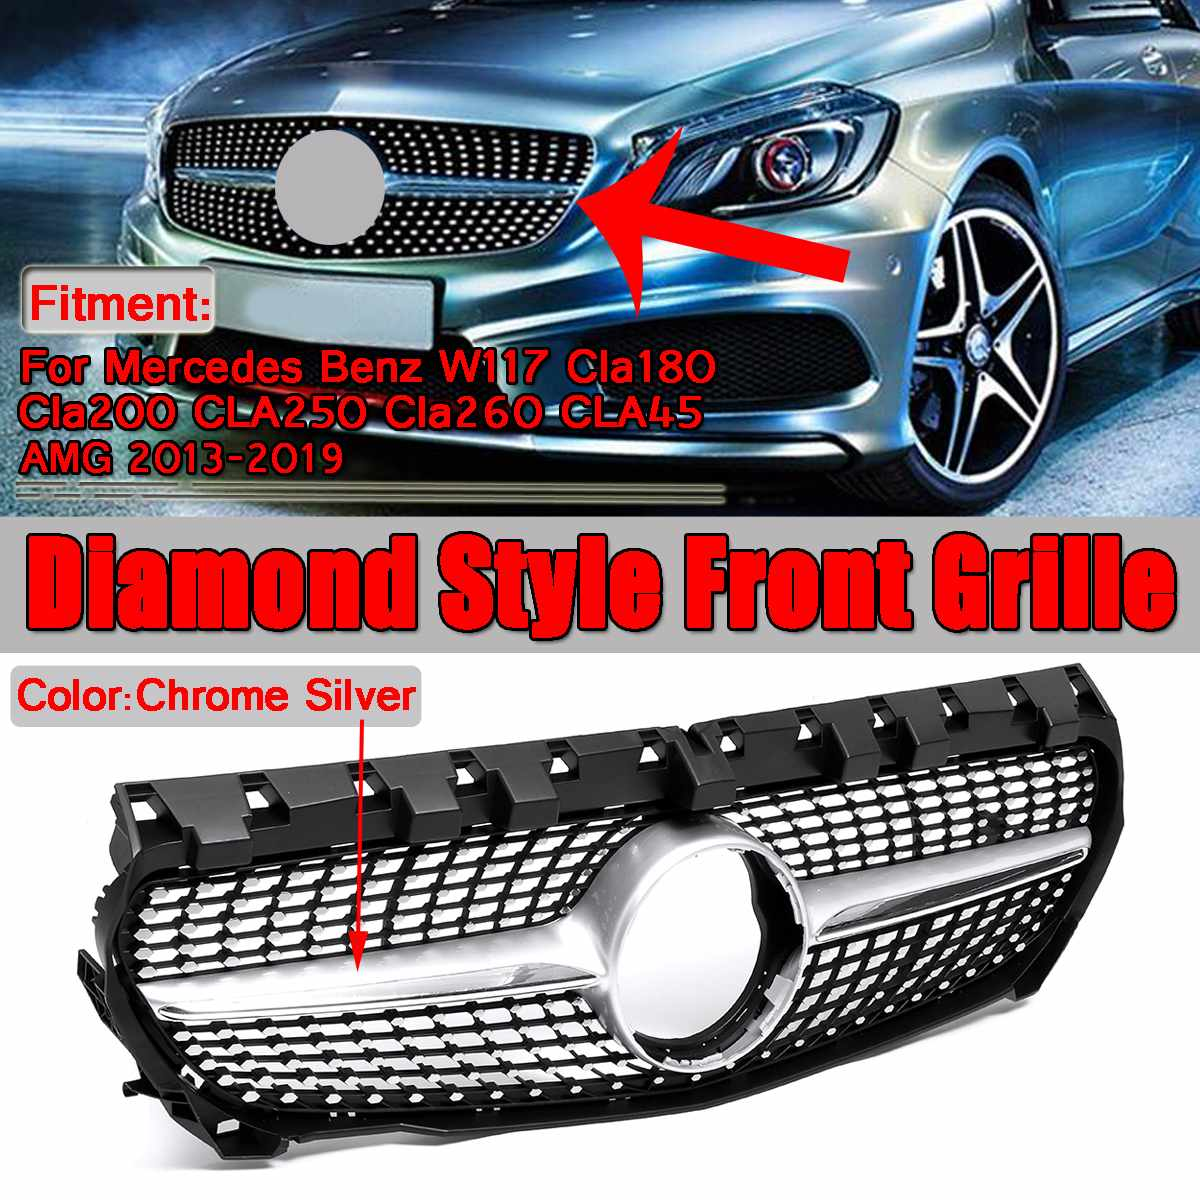 1x Новый Алмаз Стиль автомобилей Передняя решетка гриль для Mercedes Benz W117 CLA180 CLA200 CLA250 CLA260 CLA45 Для AMG 2013 2019